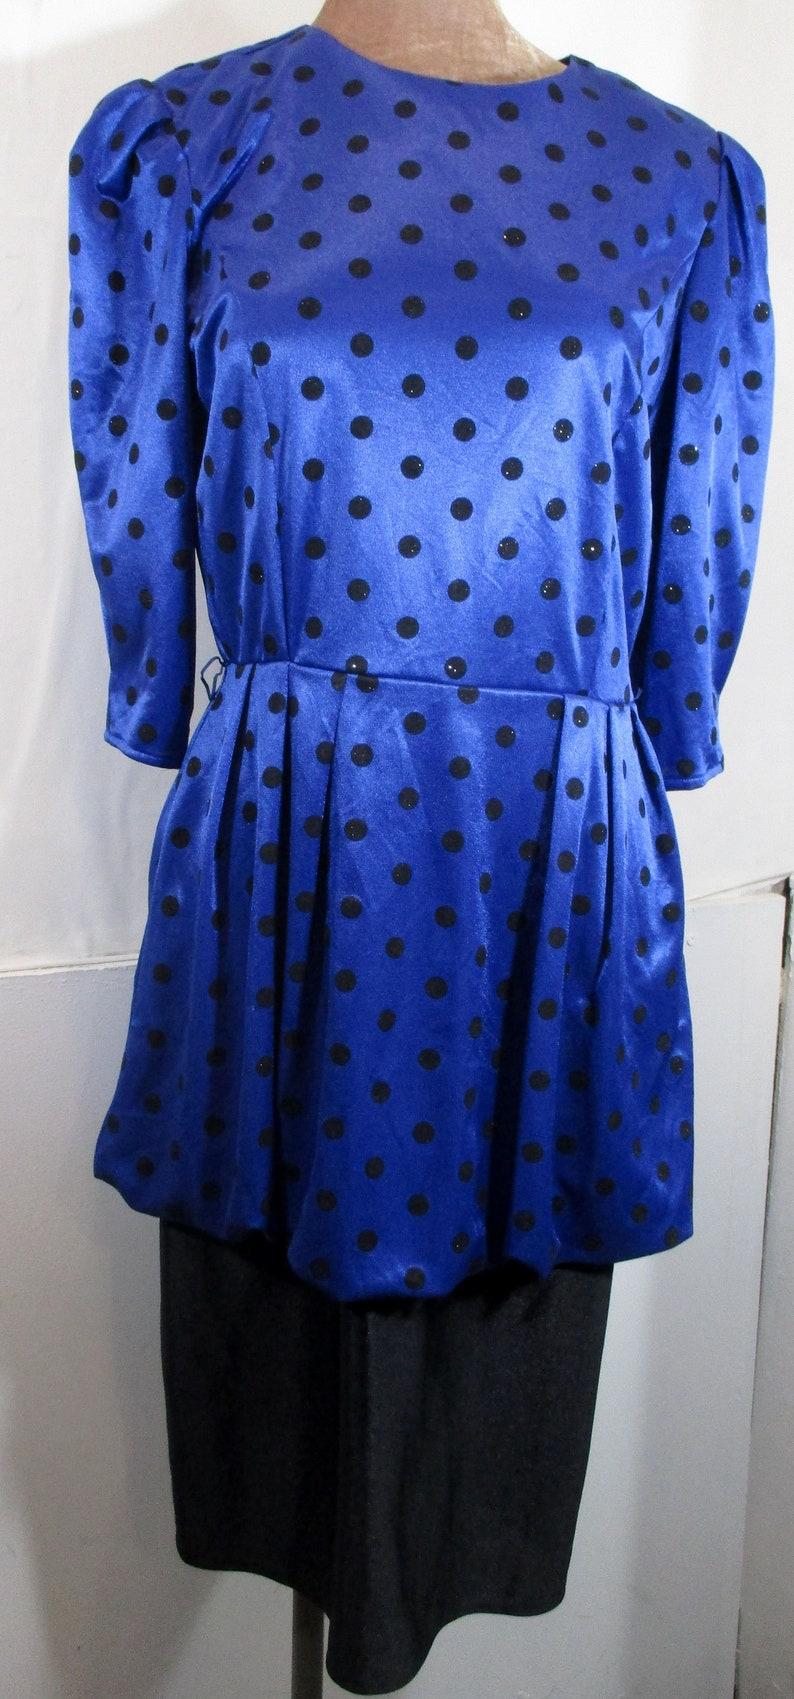 Quality Retro Fashion- Bust 40 1960s Vintage Womens Blue/&Black Glitter Polka dot Dress MEDIUM Size 14 by Yessica